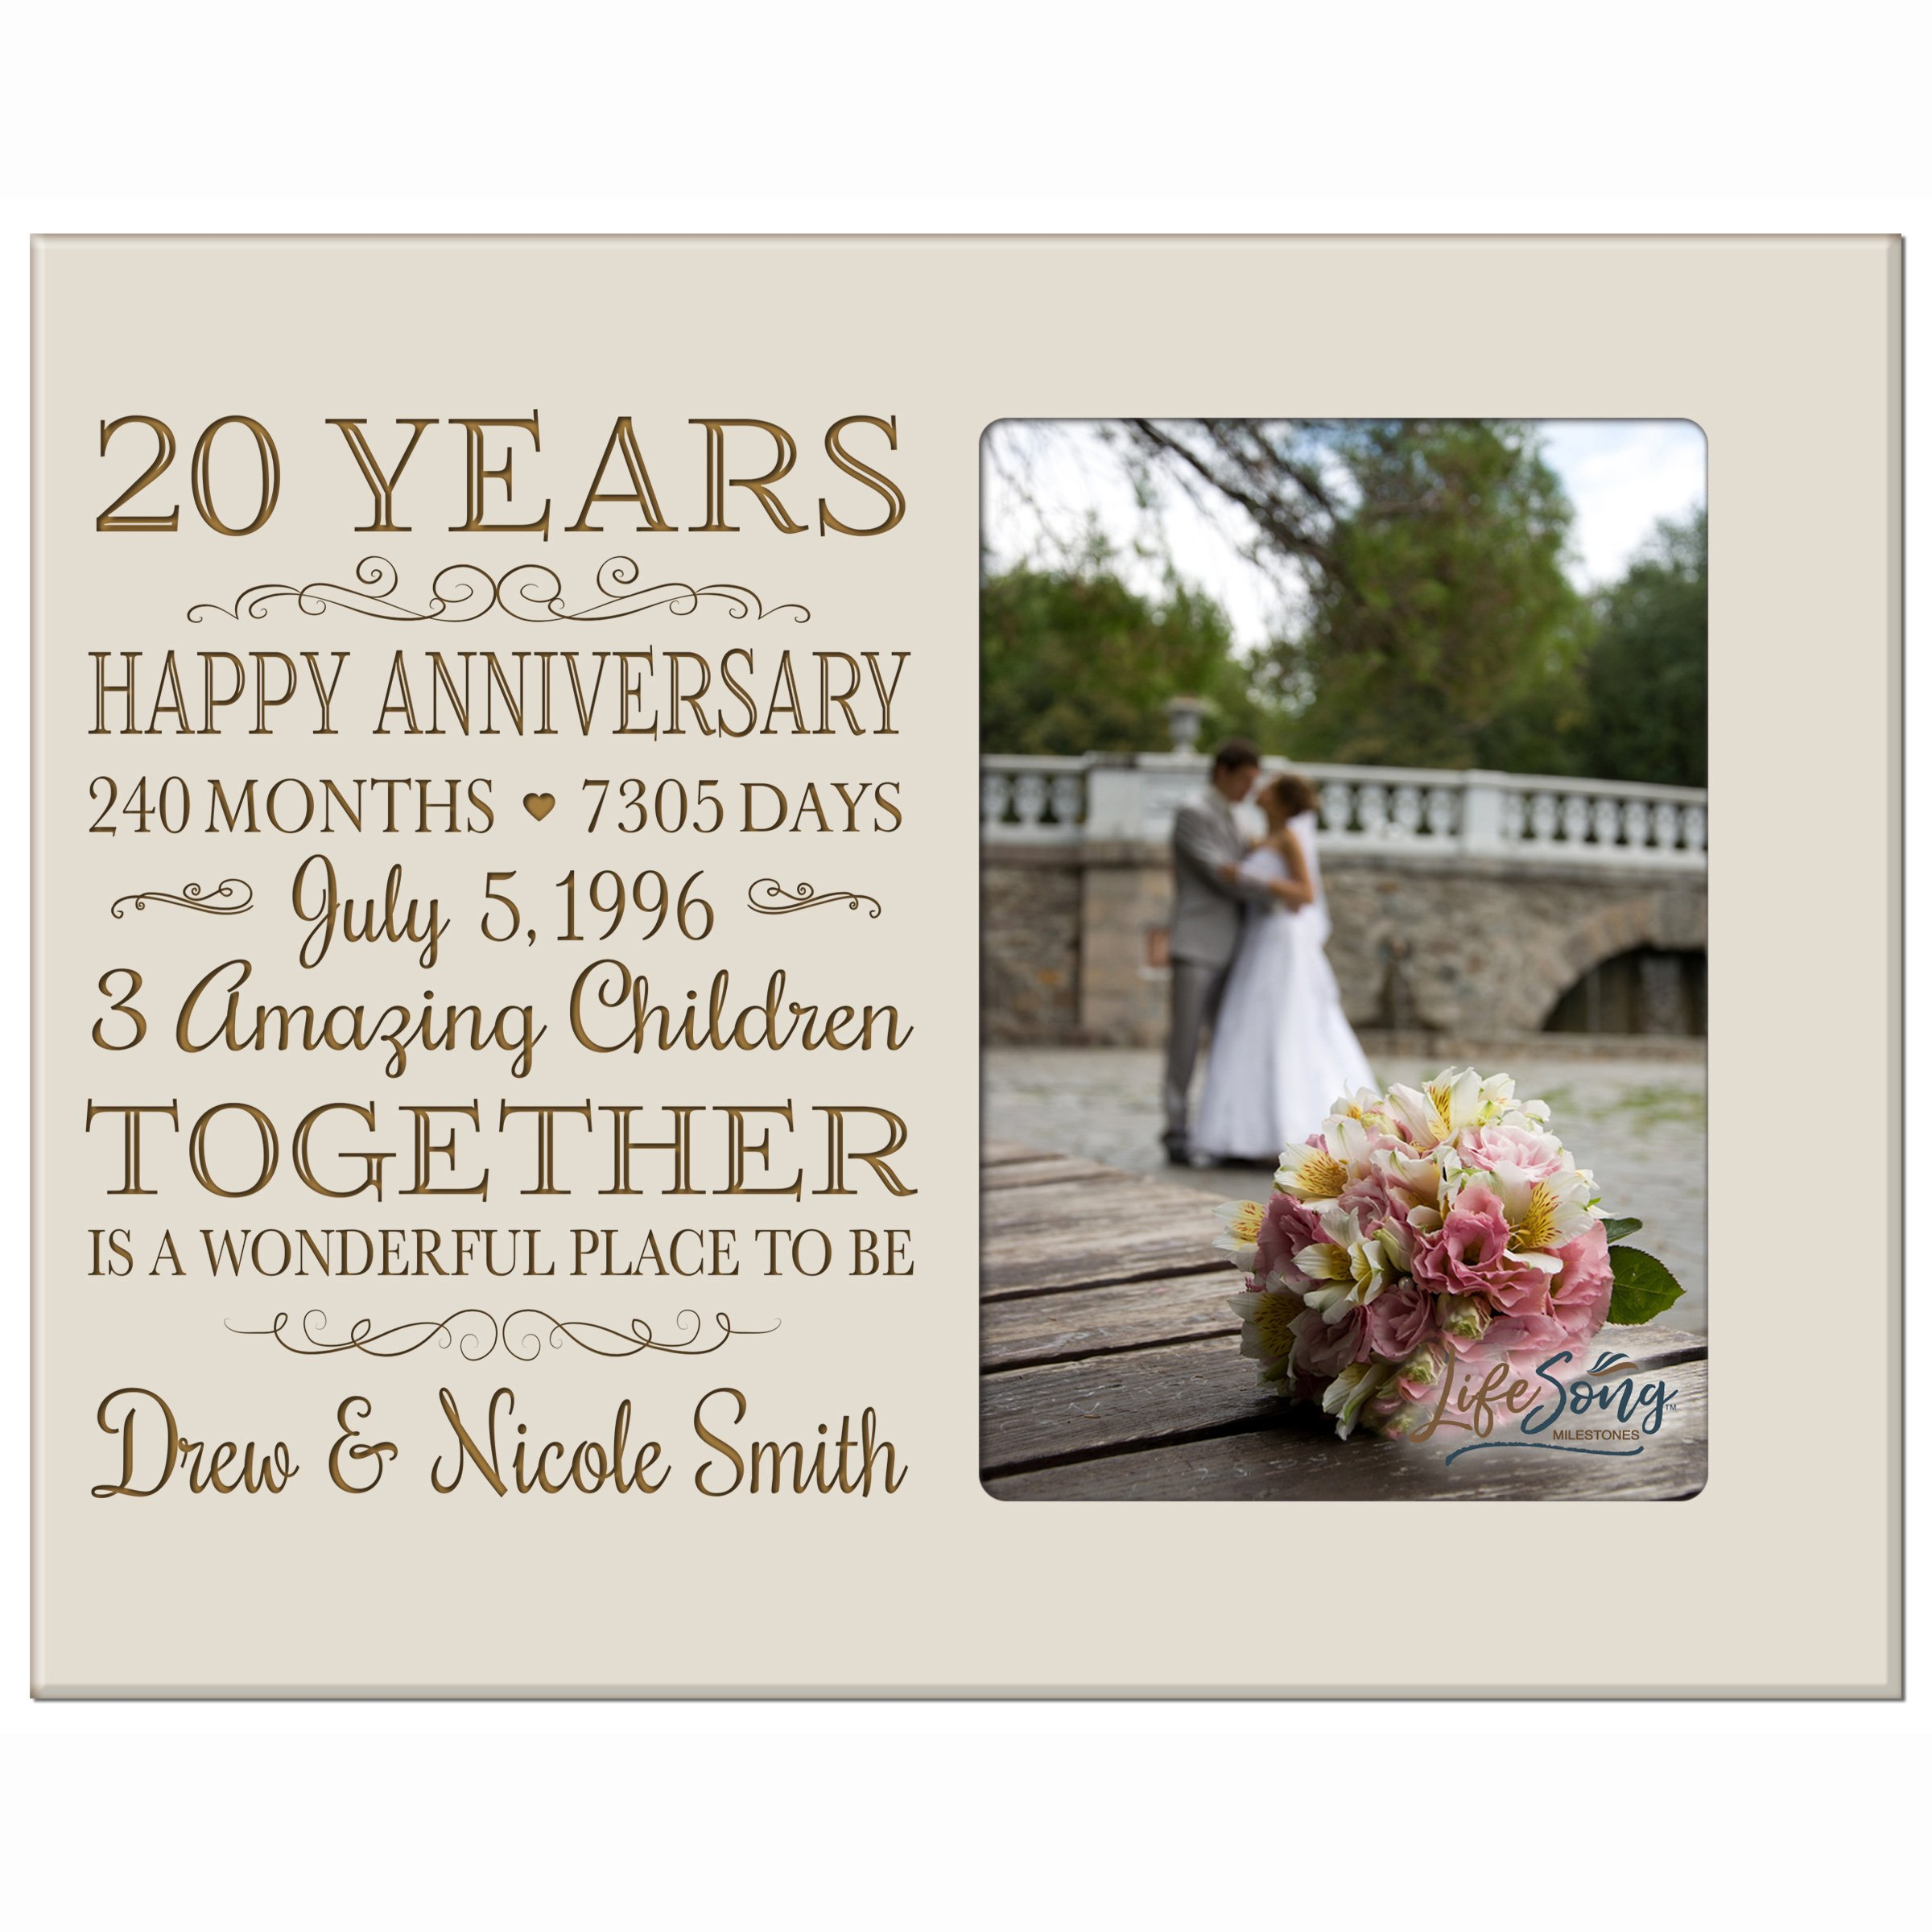 LifeSong Milestones Personalized Twenty Year for her him Couple Custom Engraved Wedding Gift for Husband Wife Girlfriend Boyfriend Photo Frame Holds 4x6 Photo (Ivory)